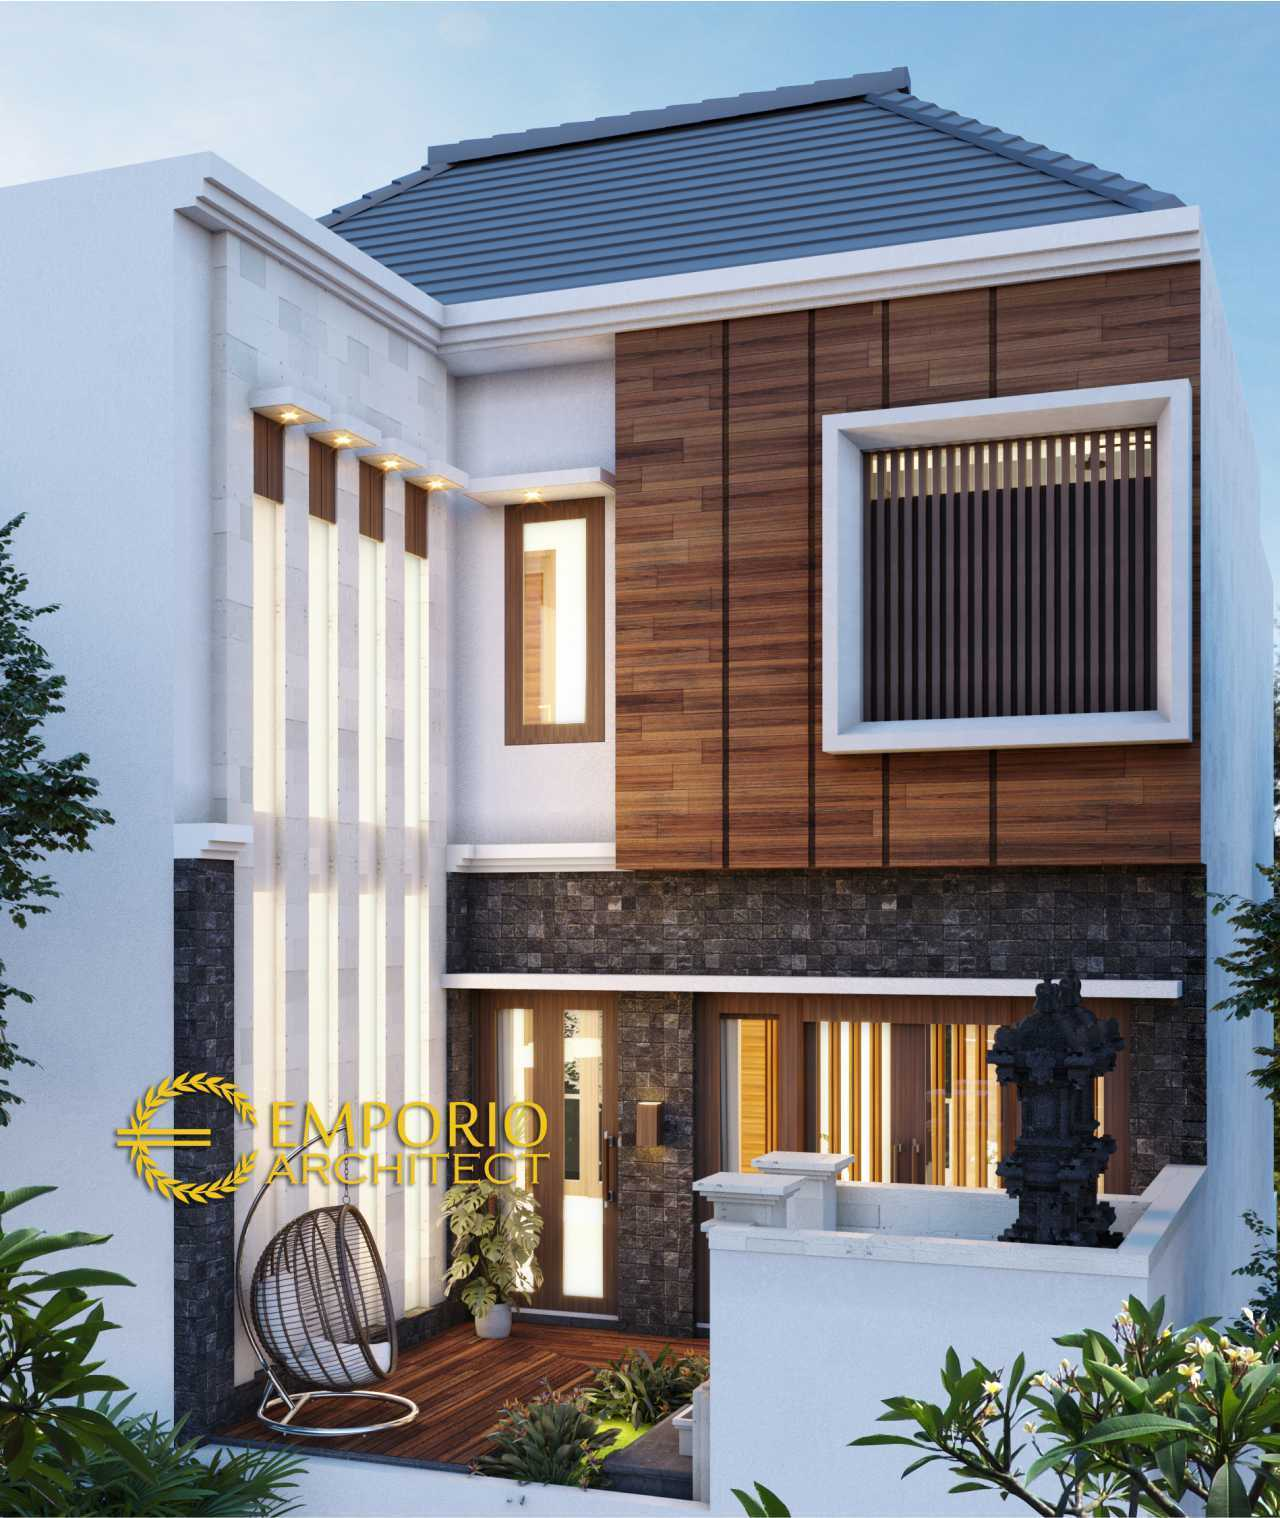 Emporio Architect Jasa Arsitek Denpasar Desain Rumah Modern 3 Lantai 734 @ Denpasar, Bali Kota Denpasar, Bali, Indonesia Kota Denpasar, Bali, Indonesia Emporio-Architect-Jasa-Arsitek-Denpasar-Desain-Rumah-Modern-3-Lantai-734-Denpasar-Bali  93964